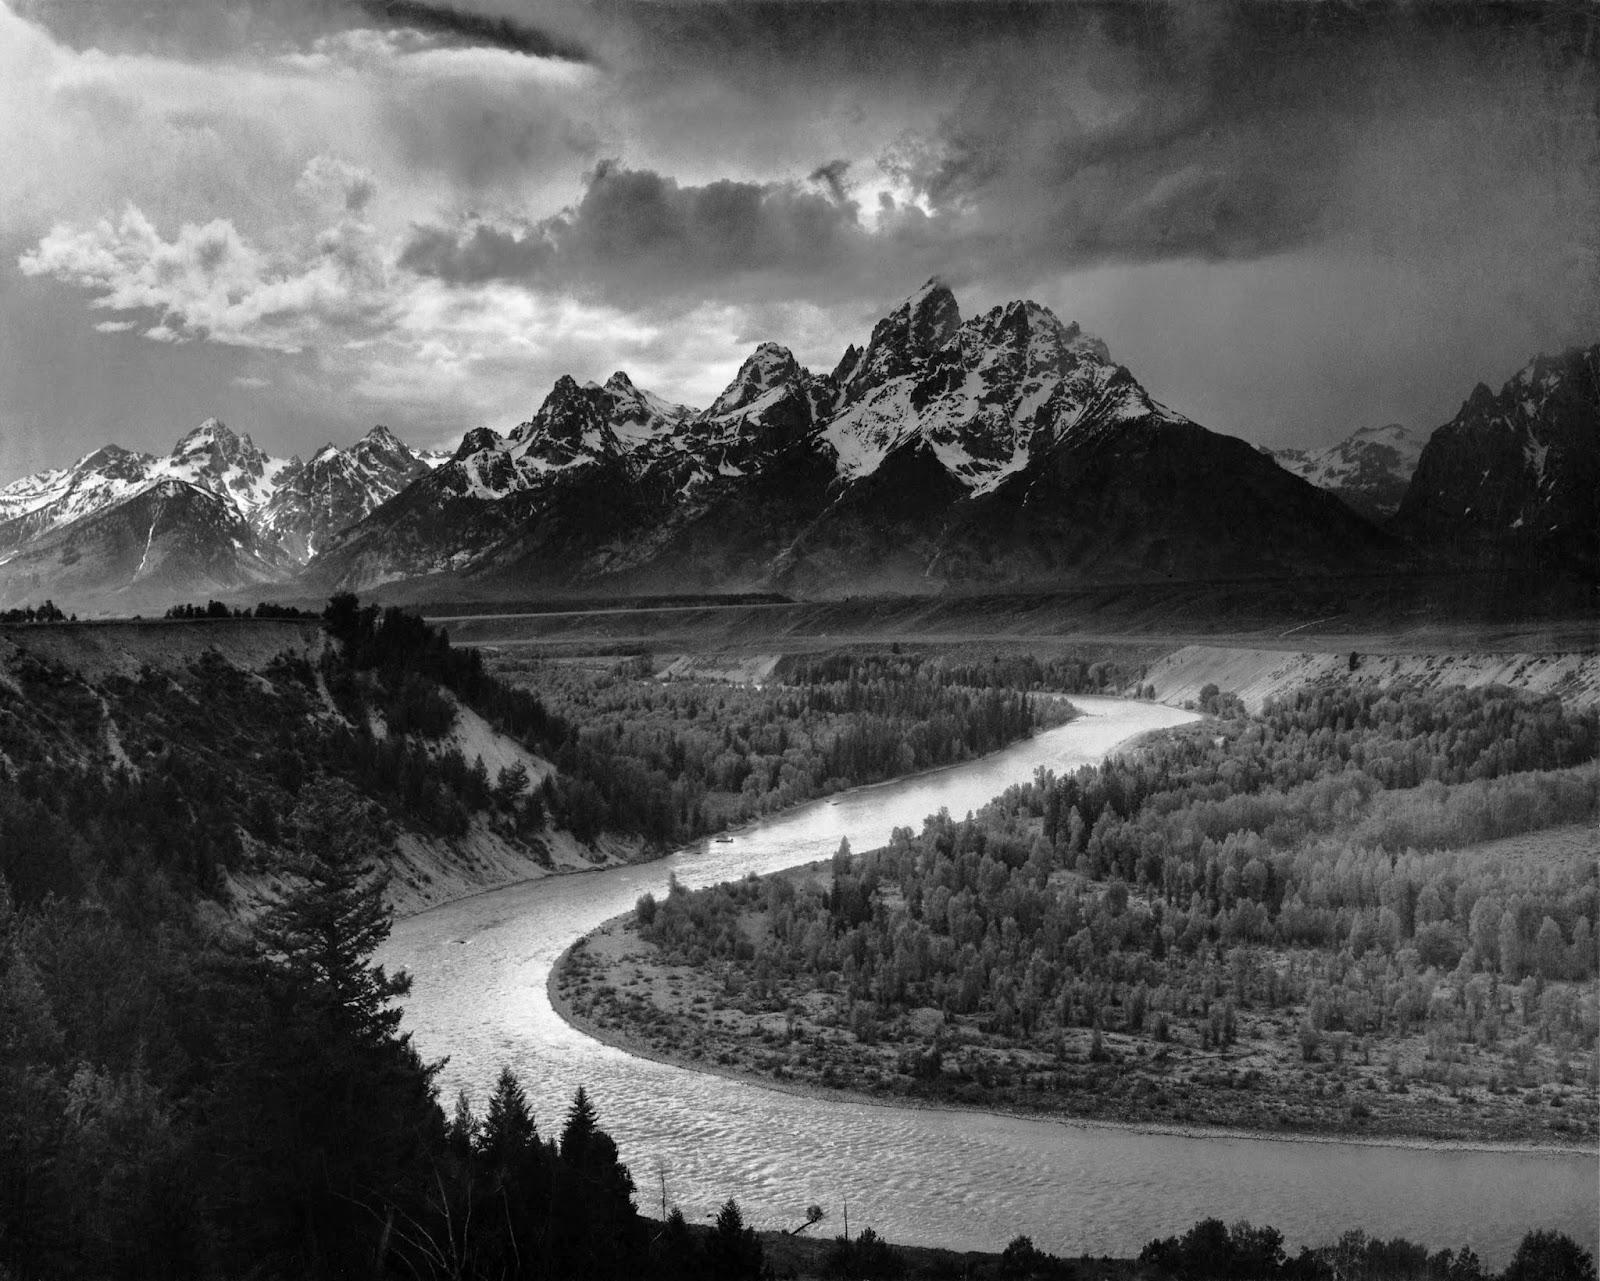 Fotografia de Ansel Adams